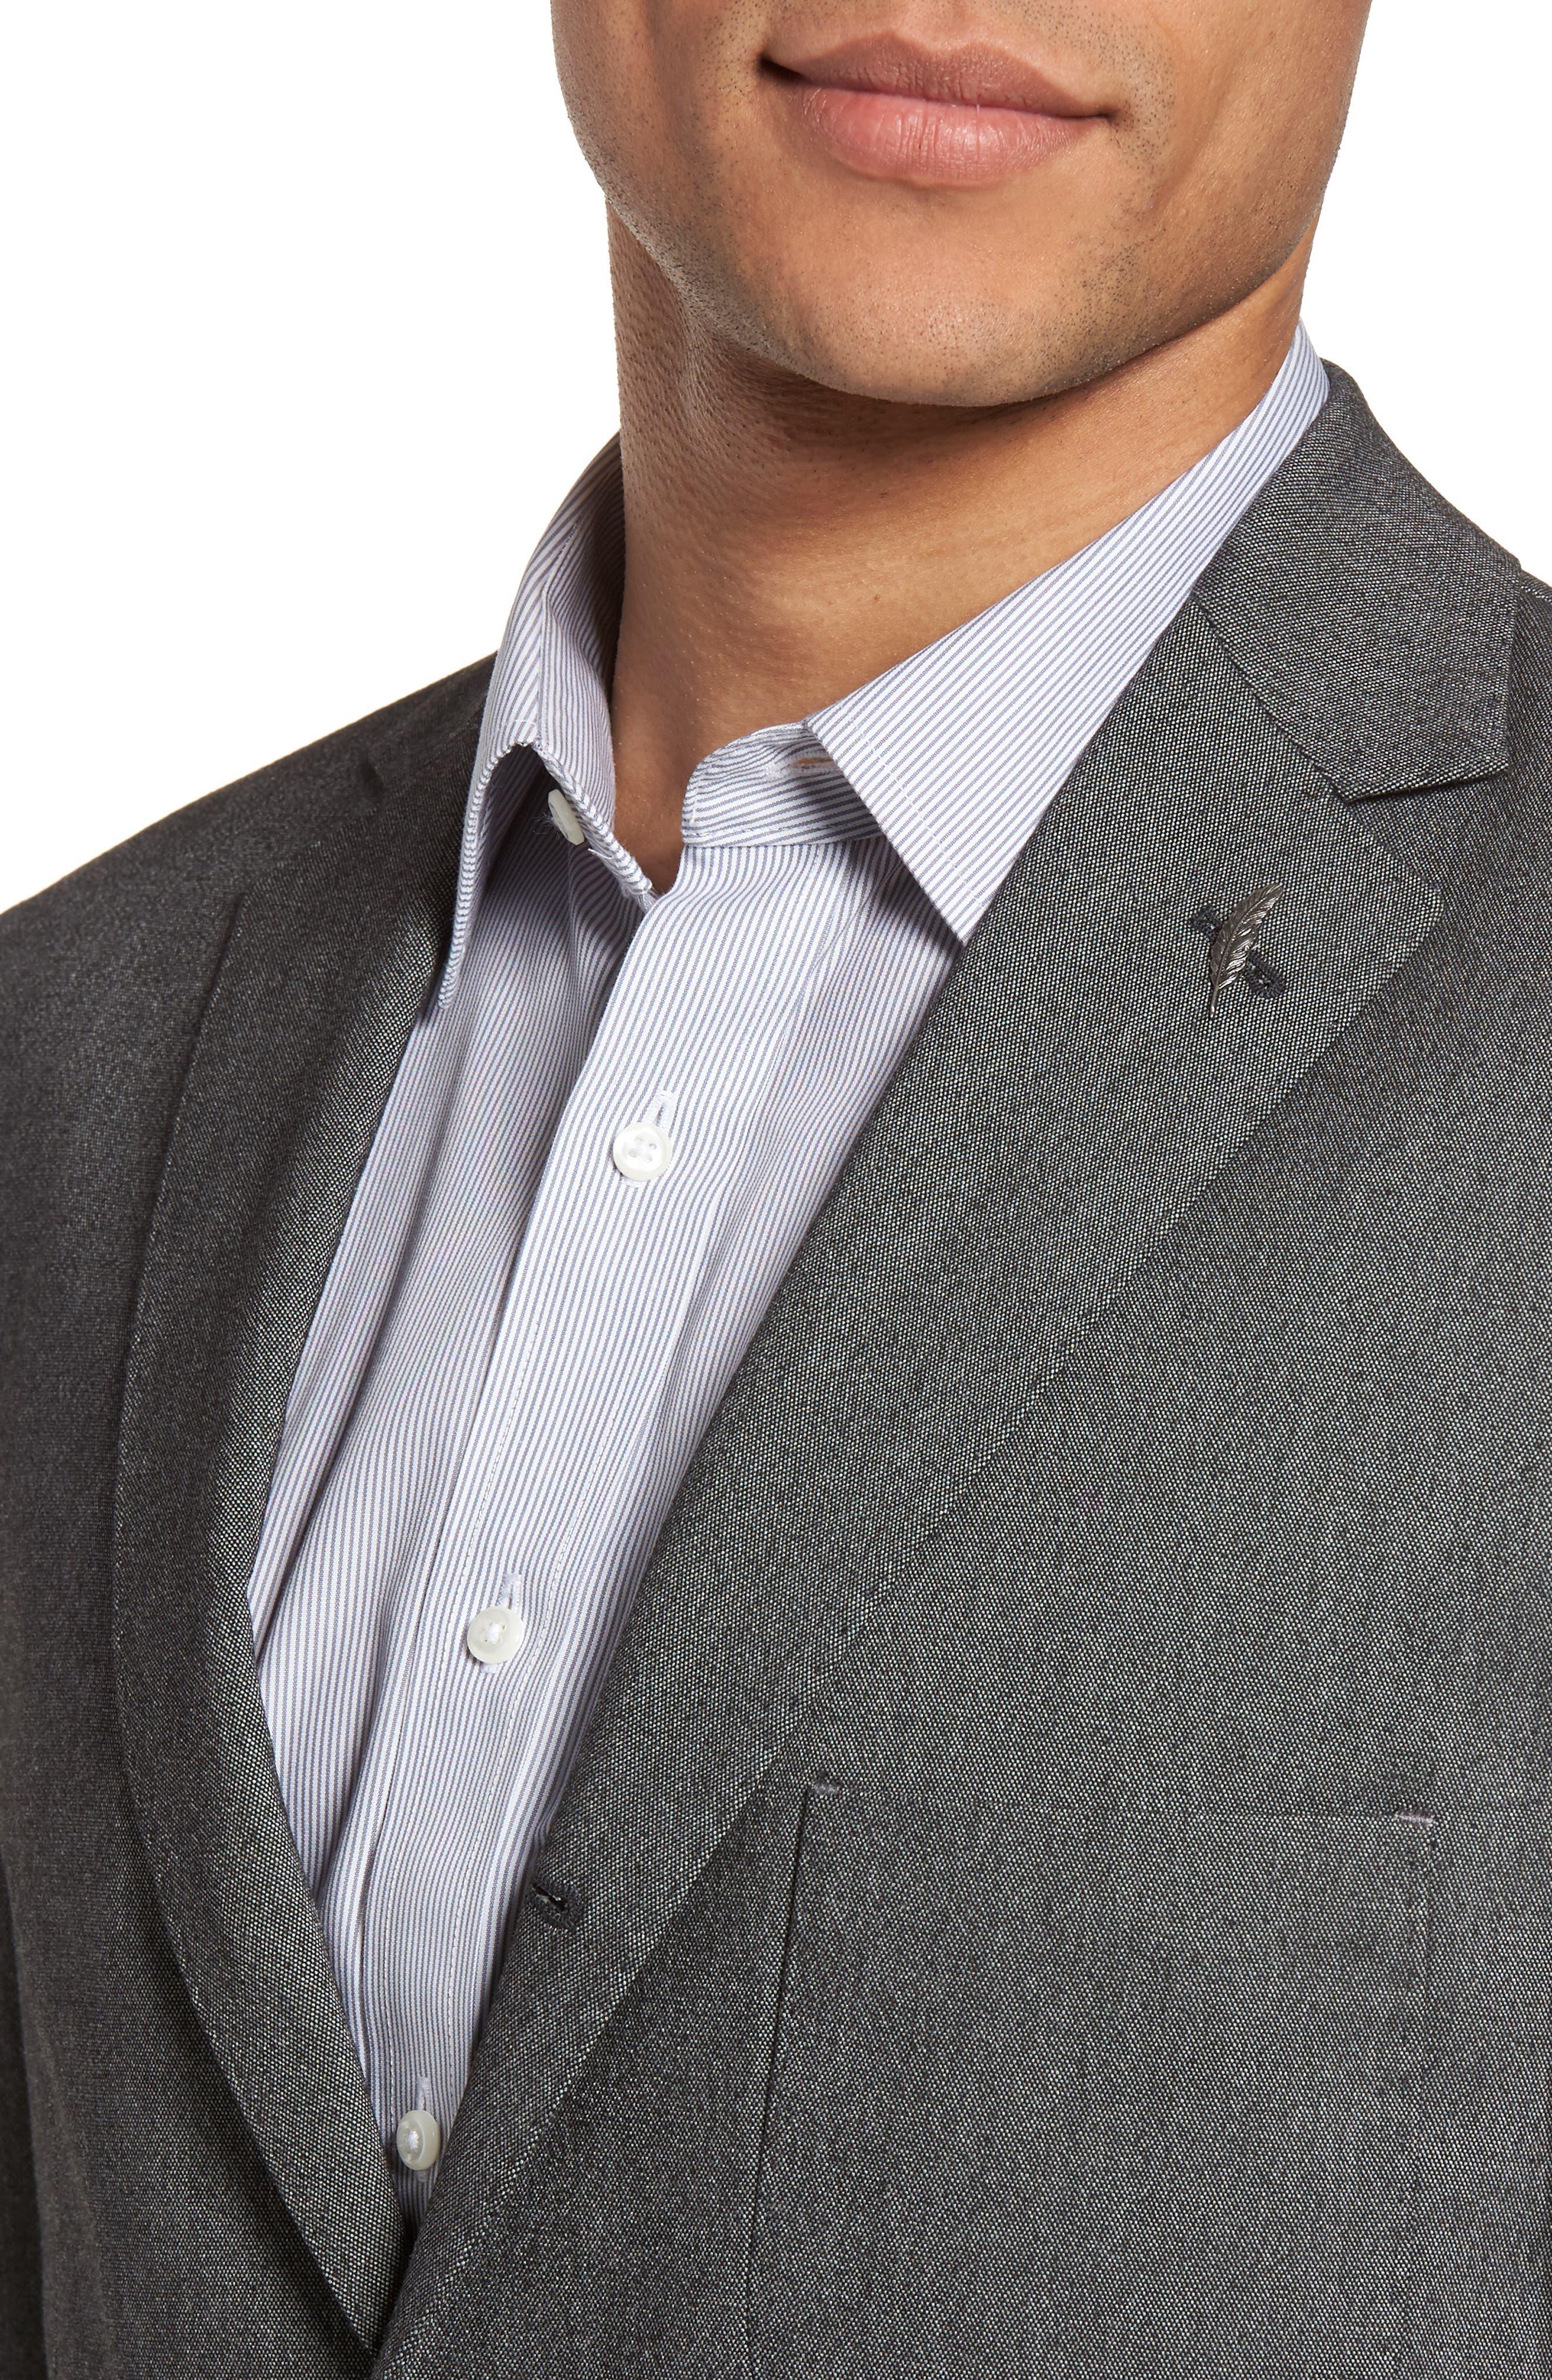 Classic Fit Birdseye Wool Sport Coat,                             Alternate thumbnail 4, color,                             020